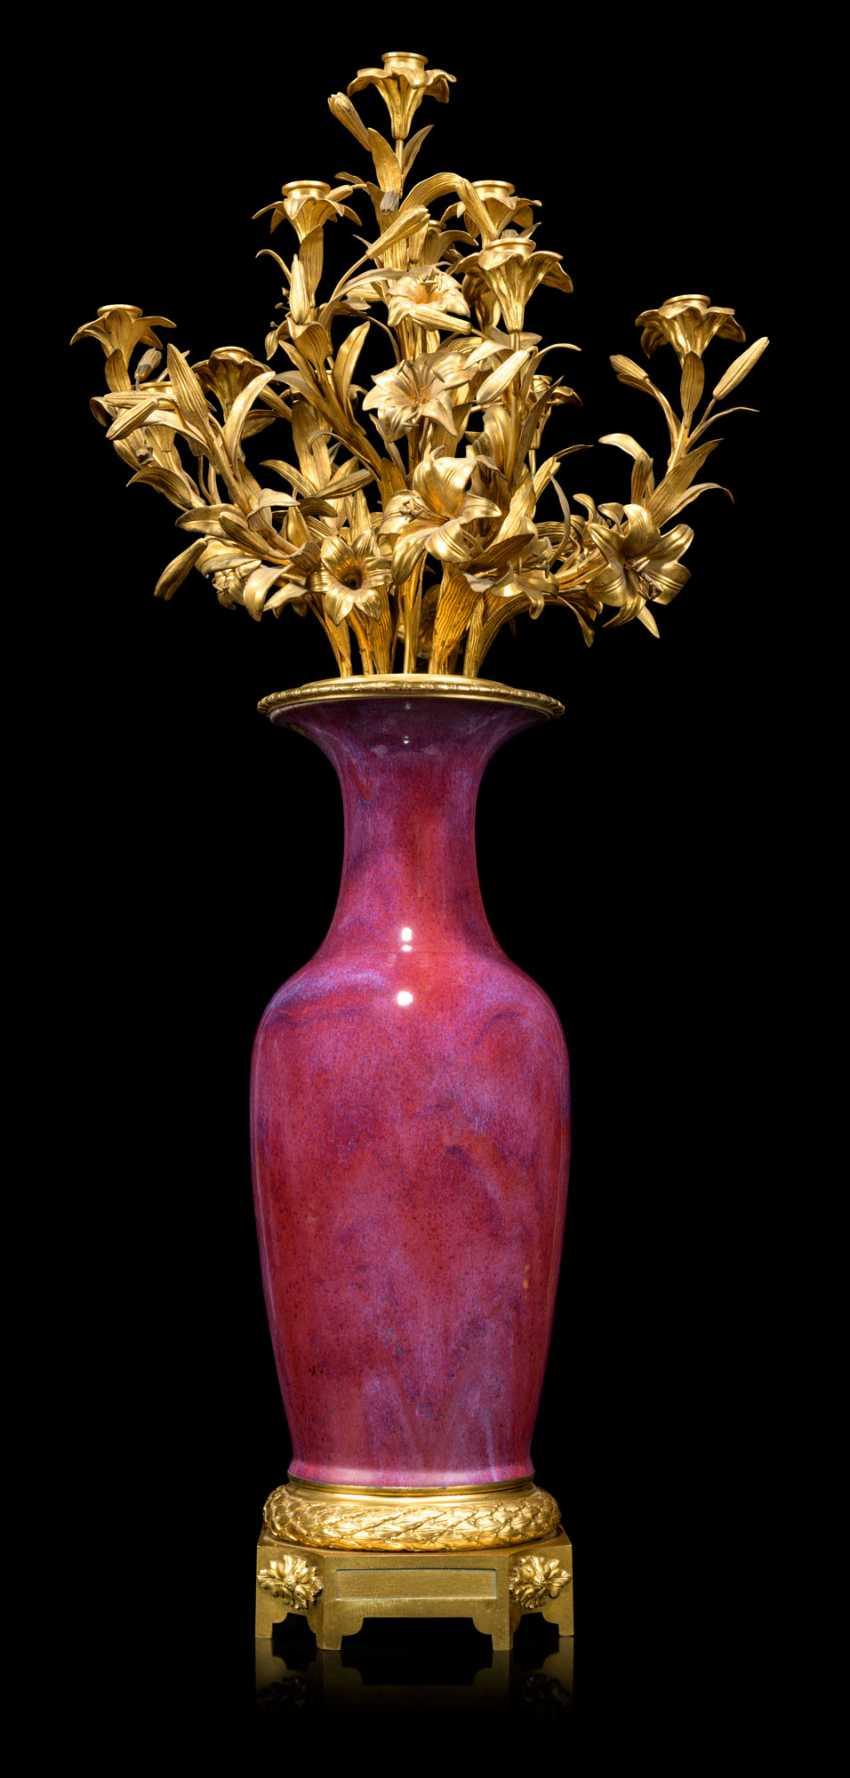 A PAIR OF FRENCH ORMOLU-MOUNTED CHINESE FLAMBE-GLAZED PORCELAIN TWELVE-LIGHT VASE-CANDELABRA - photo 2